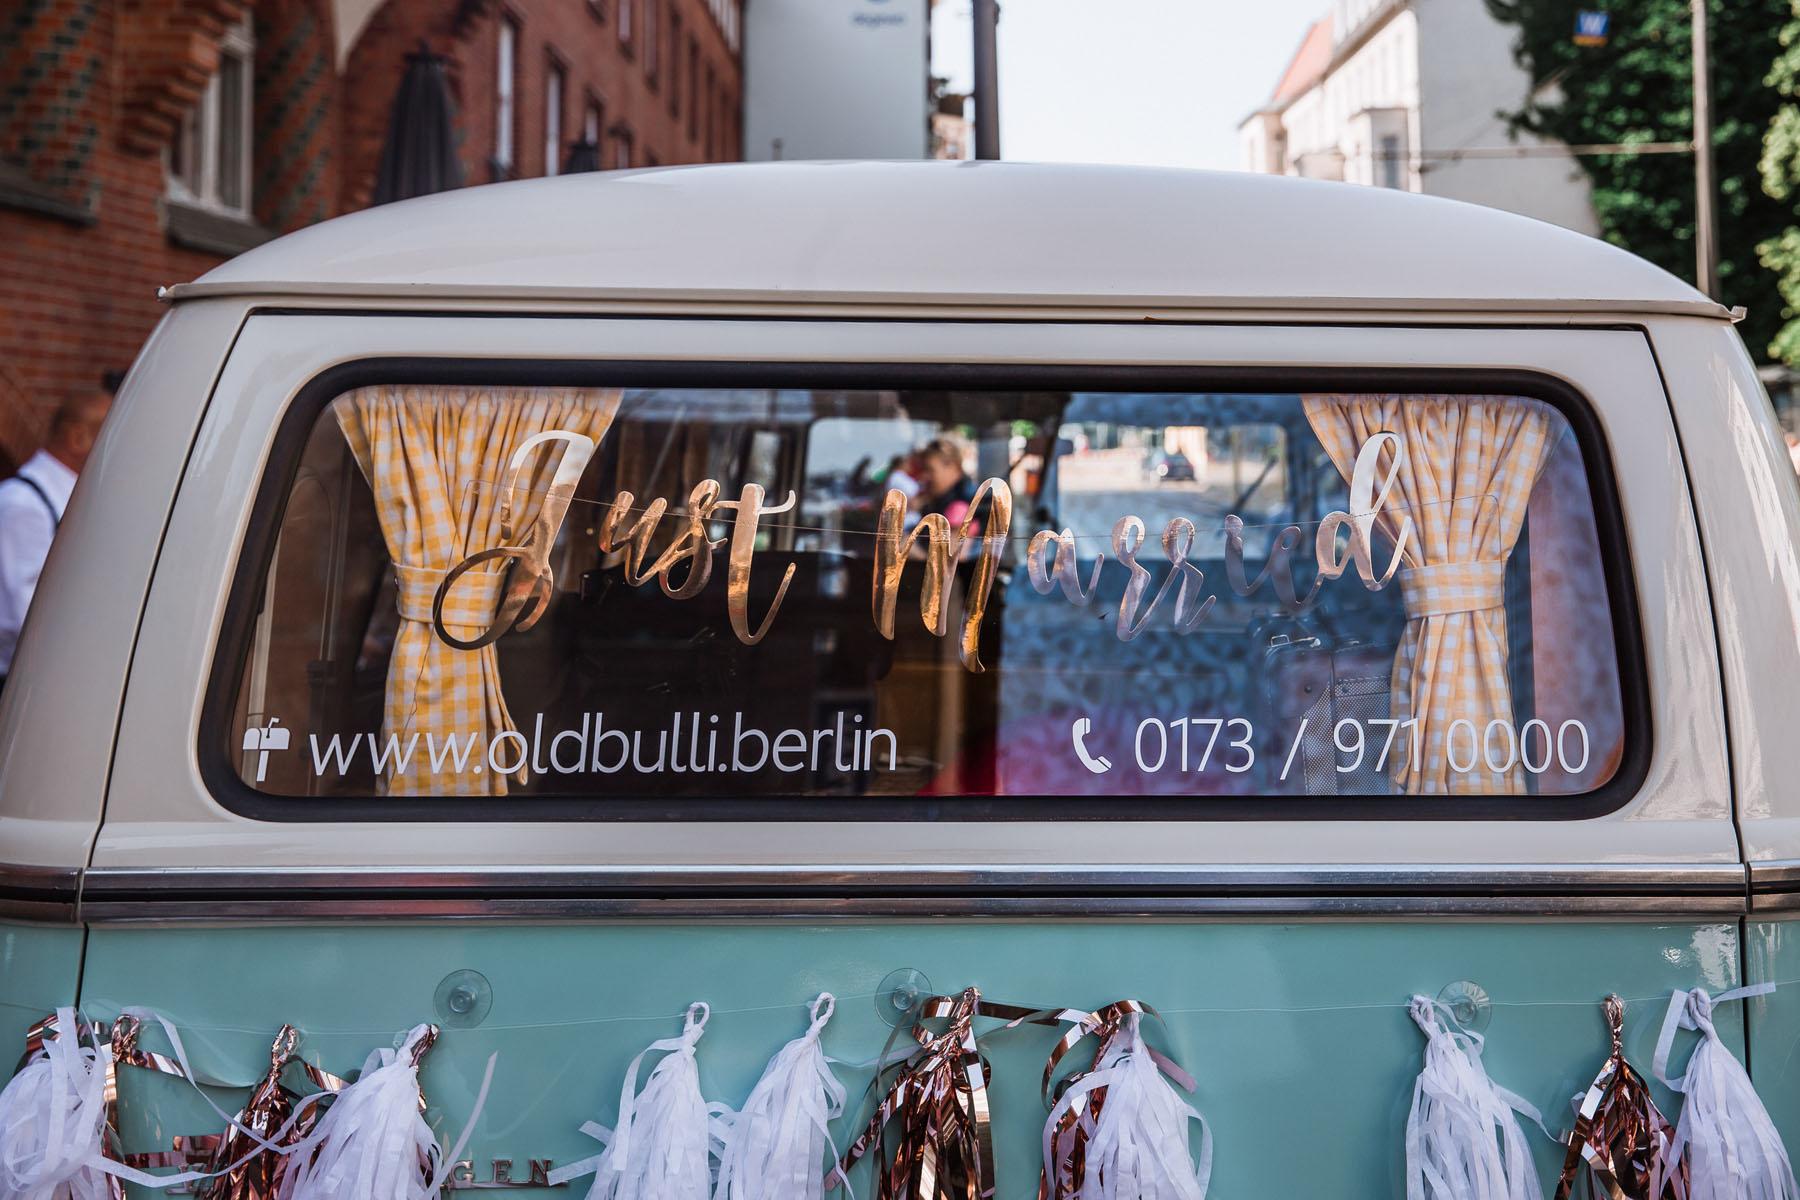 Old Bulli Berlin - T1 Vermietung - Bulli mieten - Bulli leihen - VW Bus selbst fahren - VW Bulli in Berlin mieten - Bulli Verleih Berlin